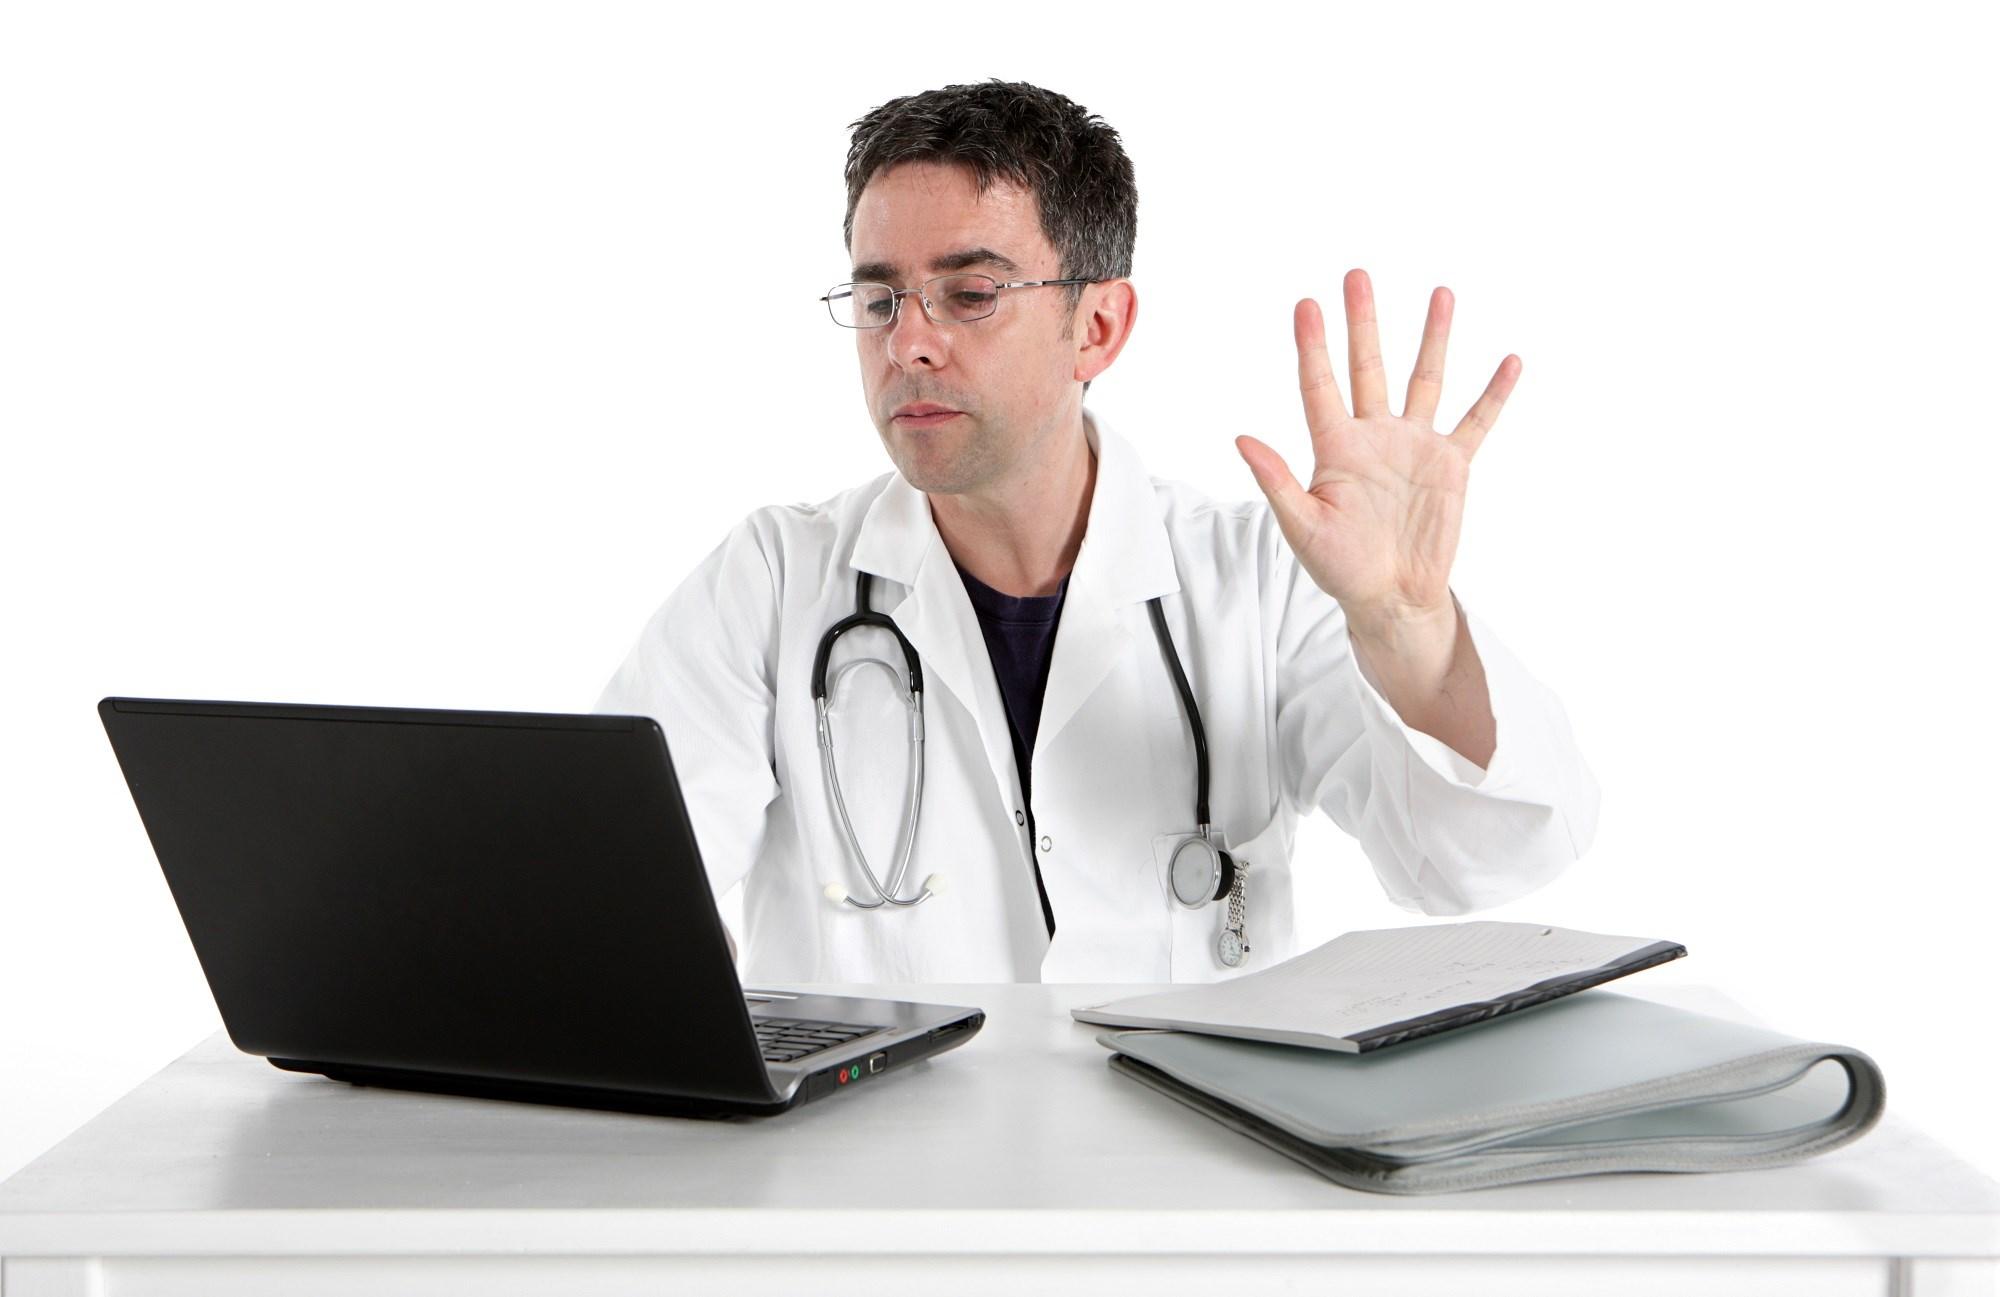 Patient Experiences Shed Light on Diagnostic Errors